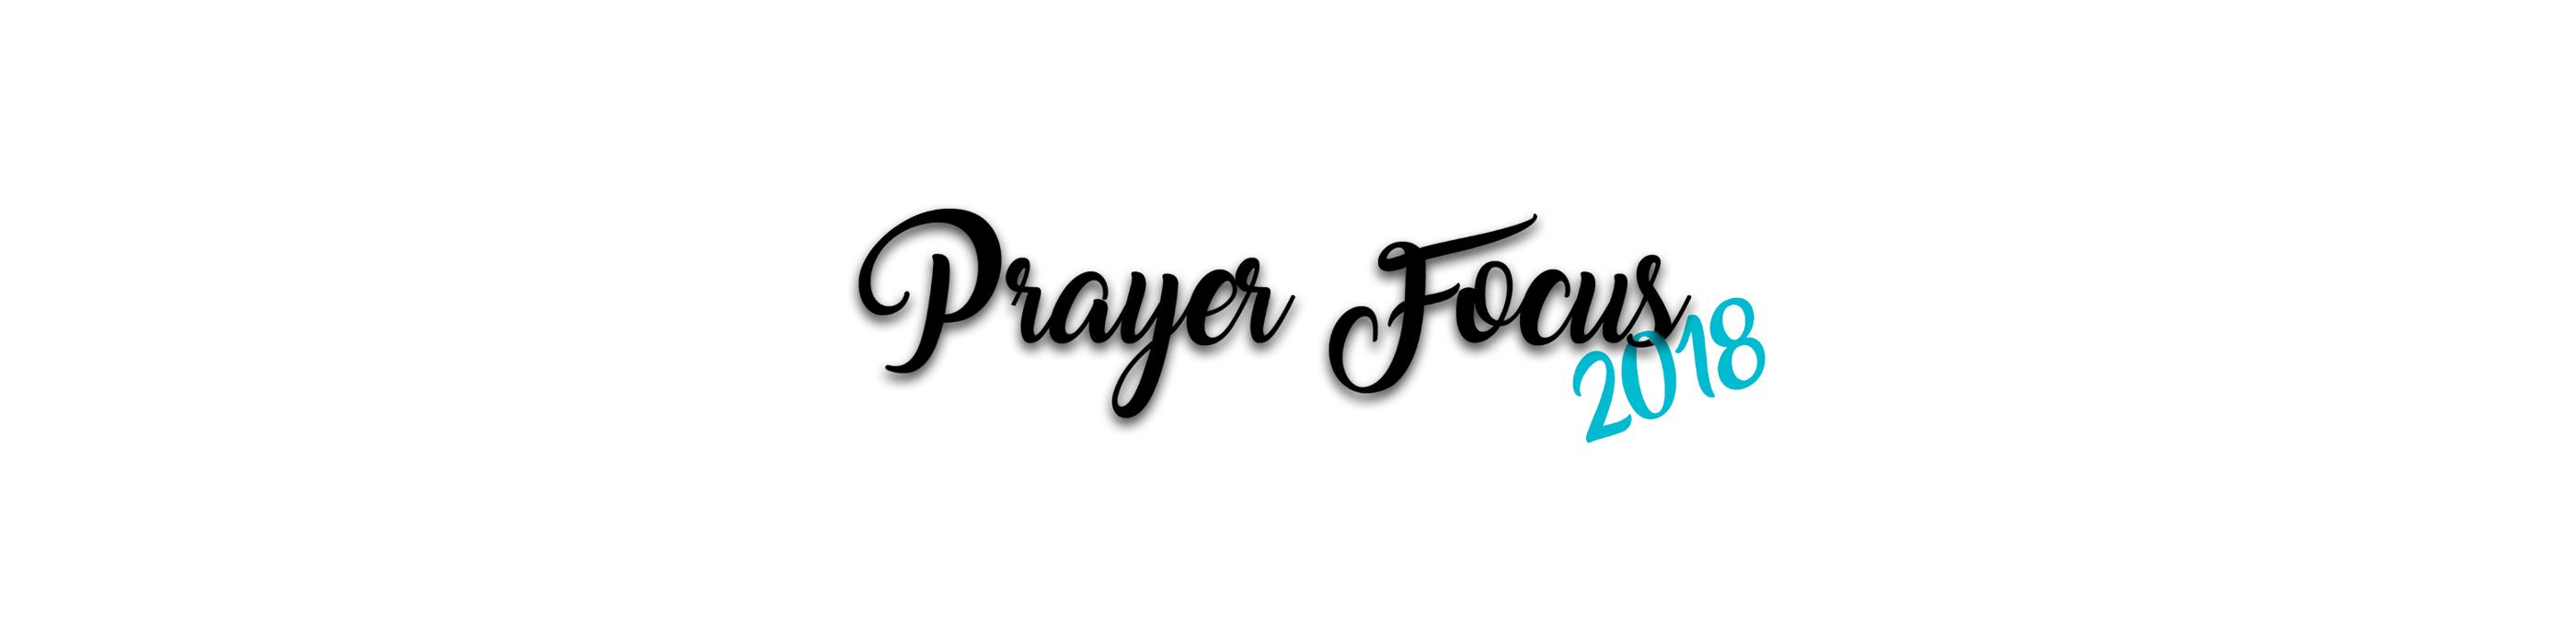 prayerfocus2018